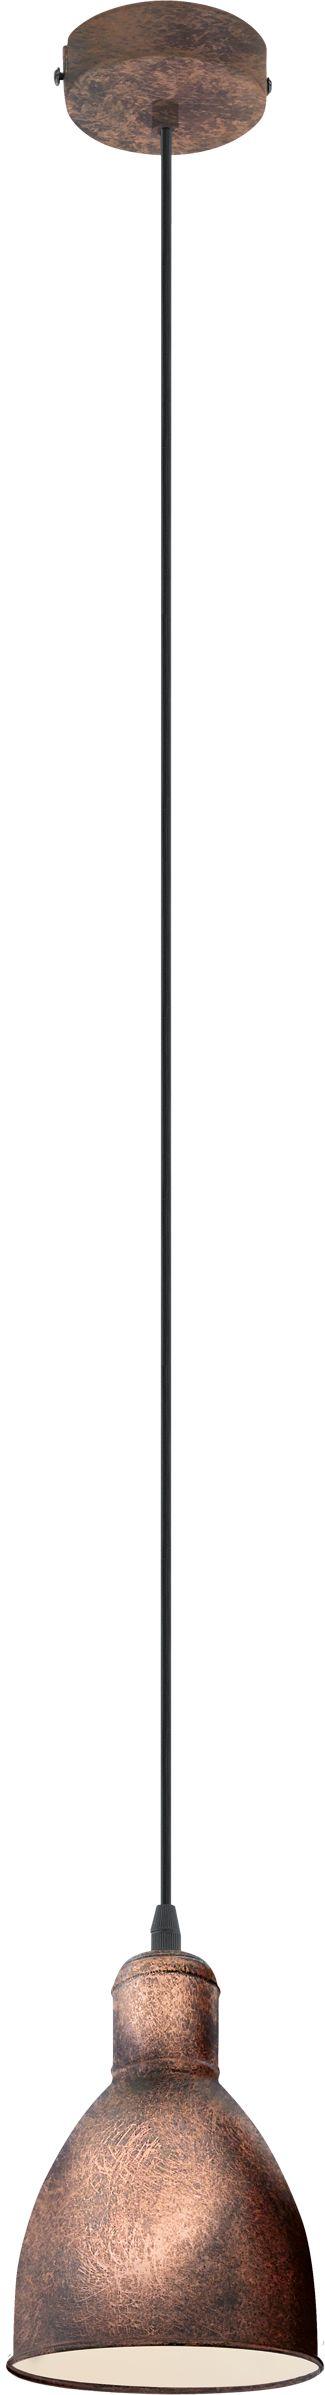 Eglo lampa wisząca Priddy 1 49492